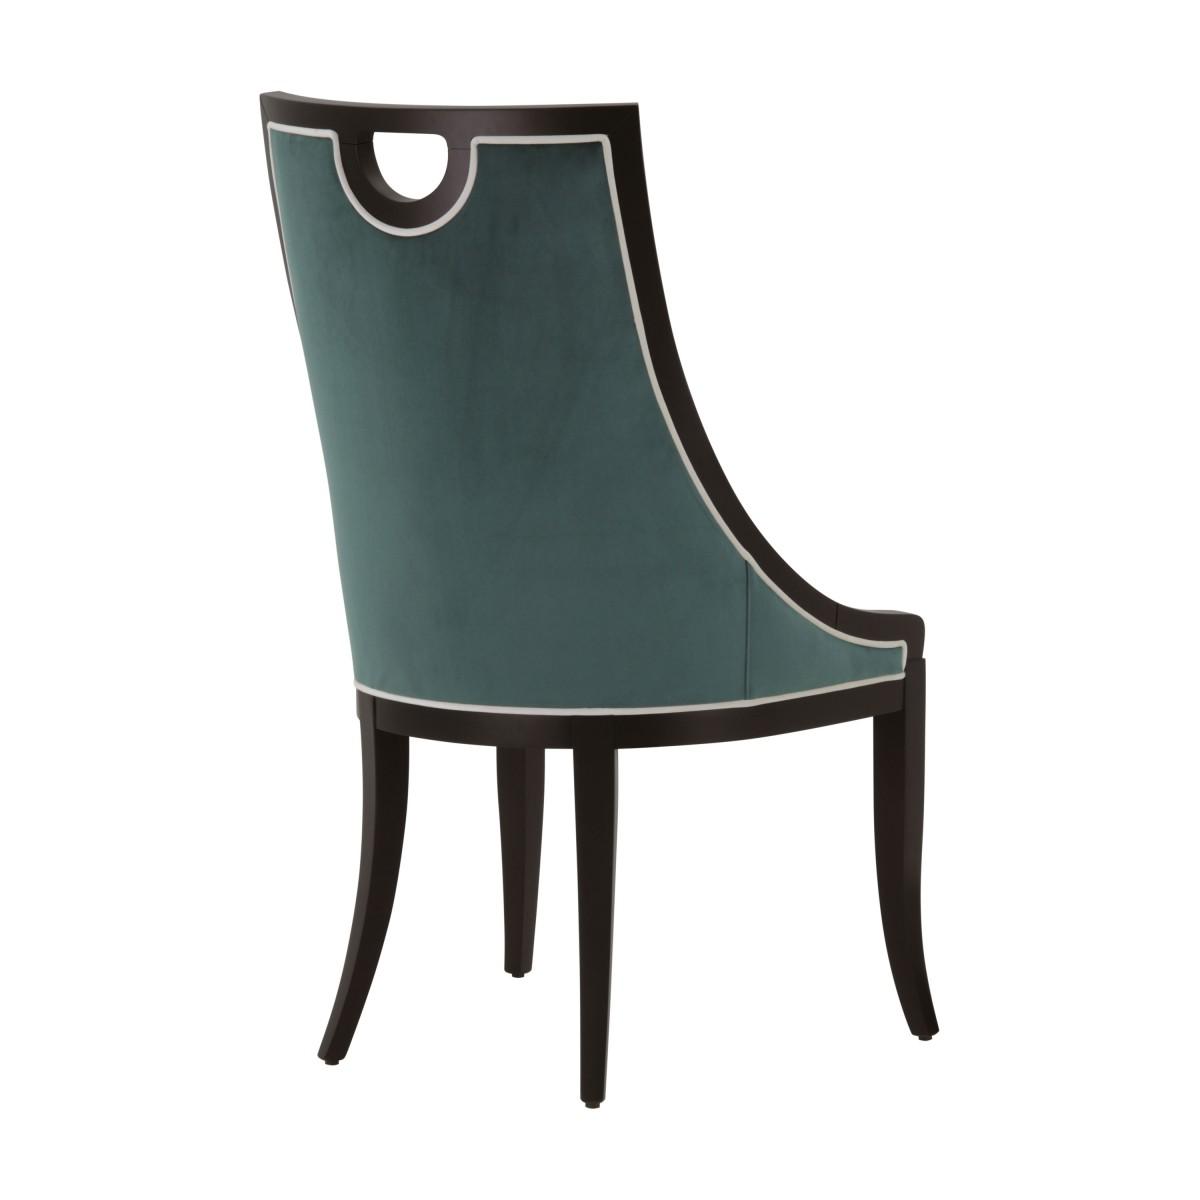 italian chair astra 4 900